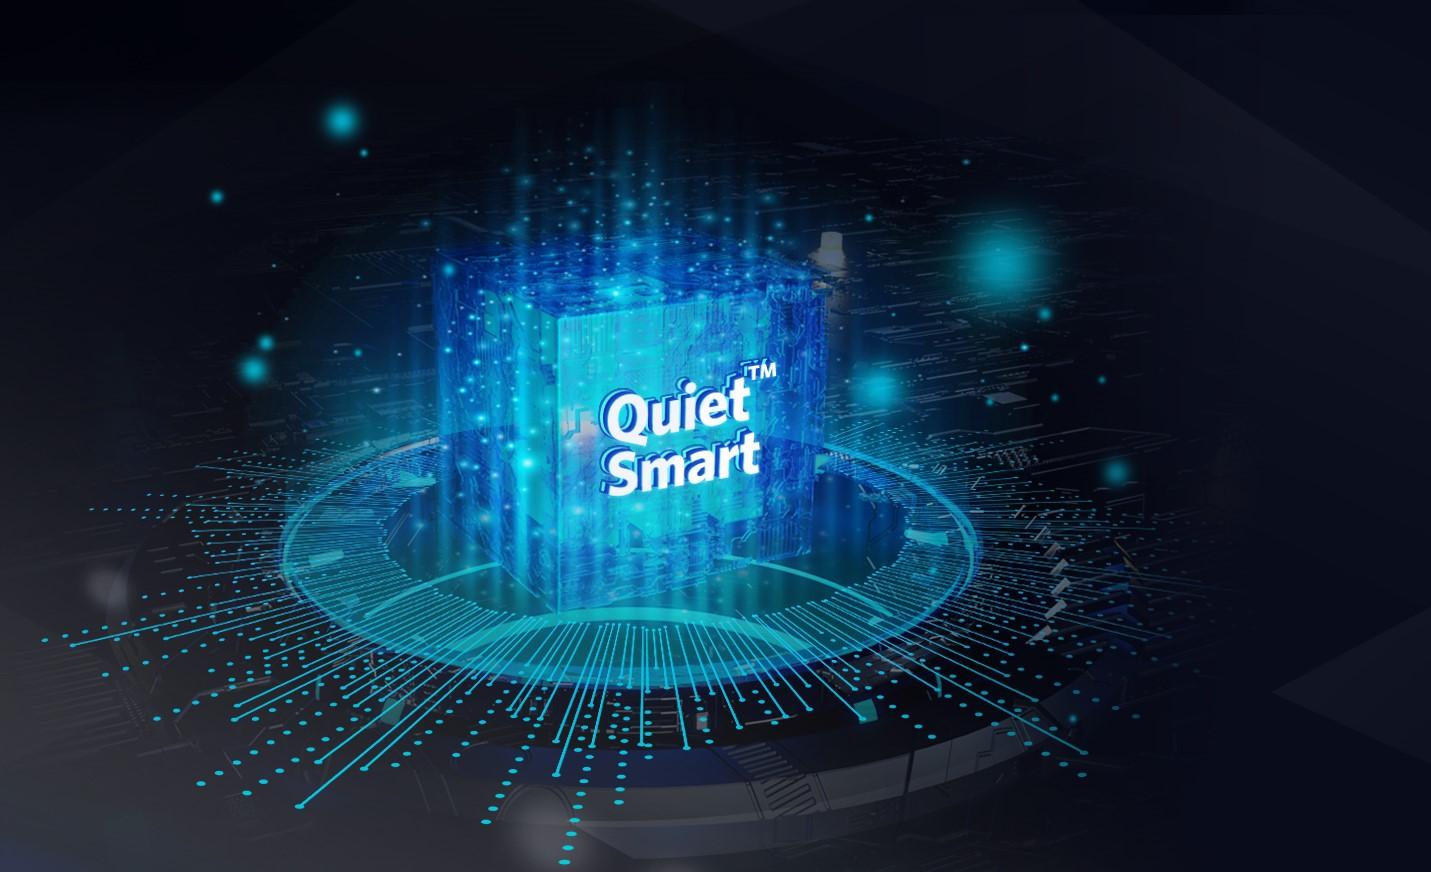 QuietSmart